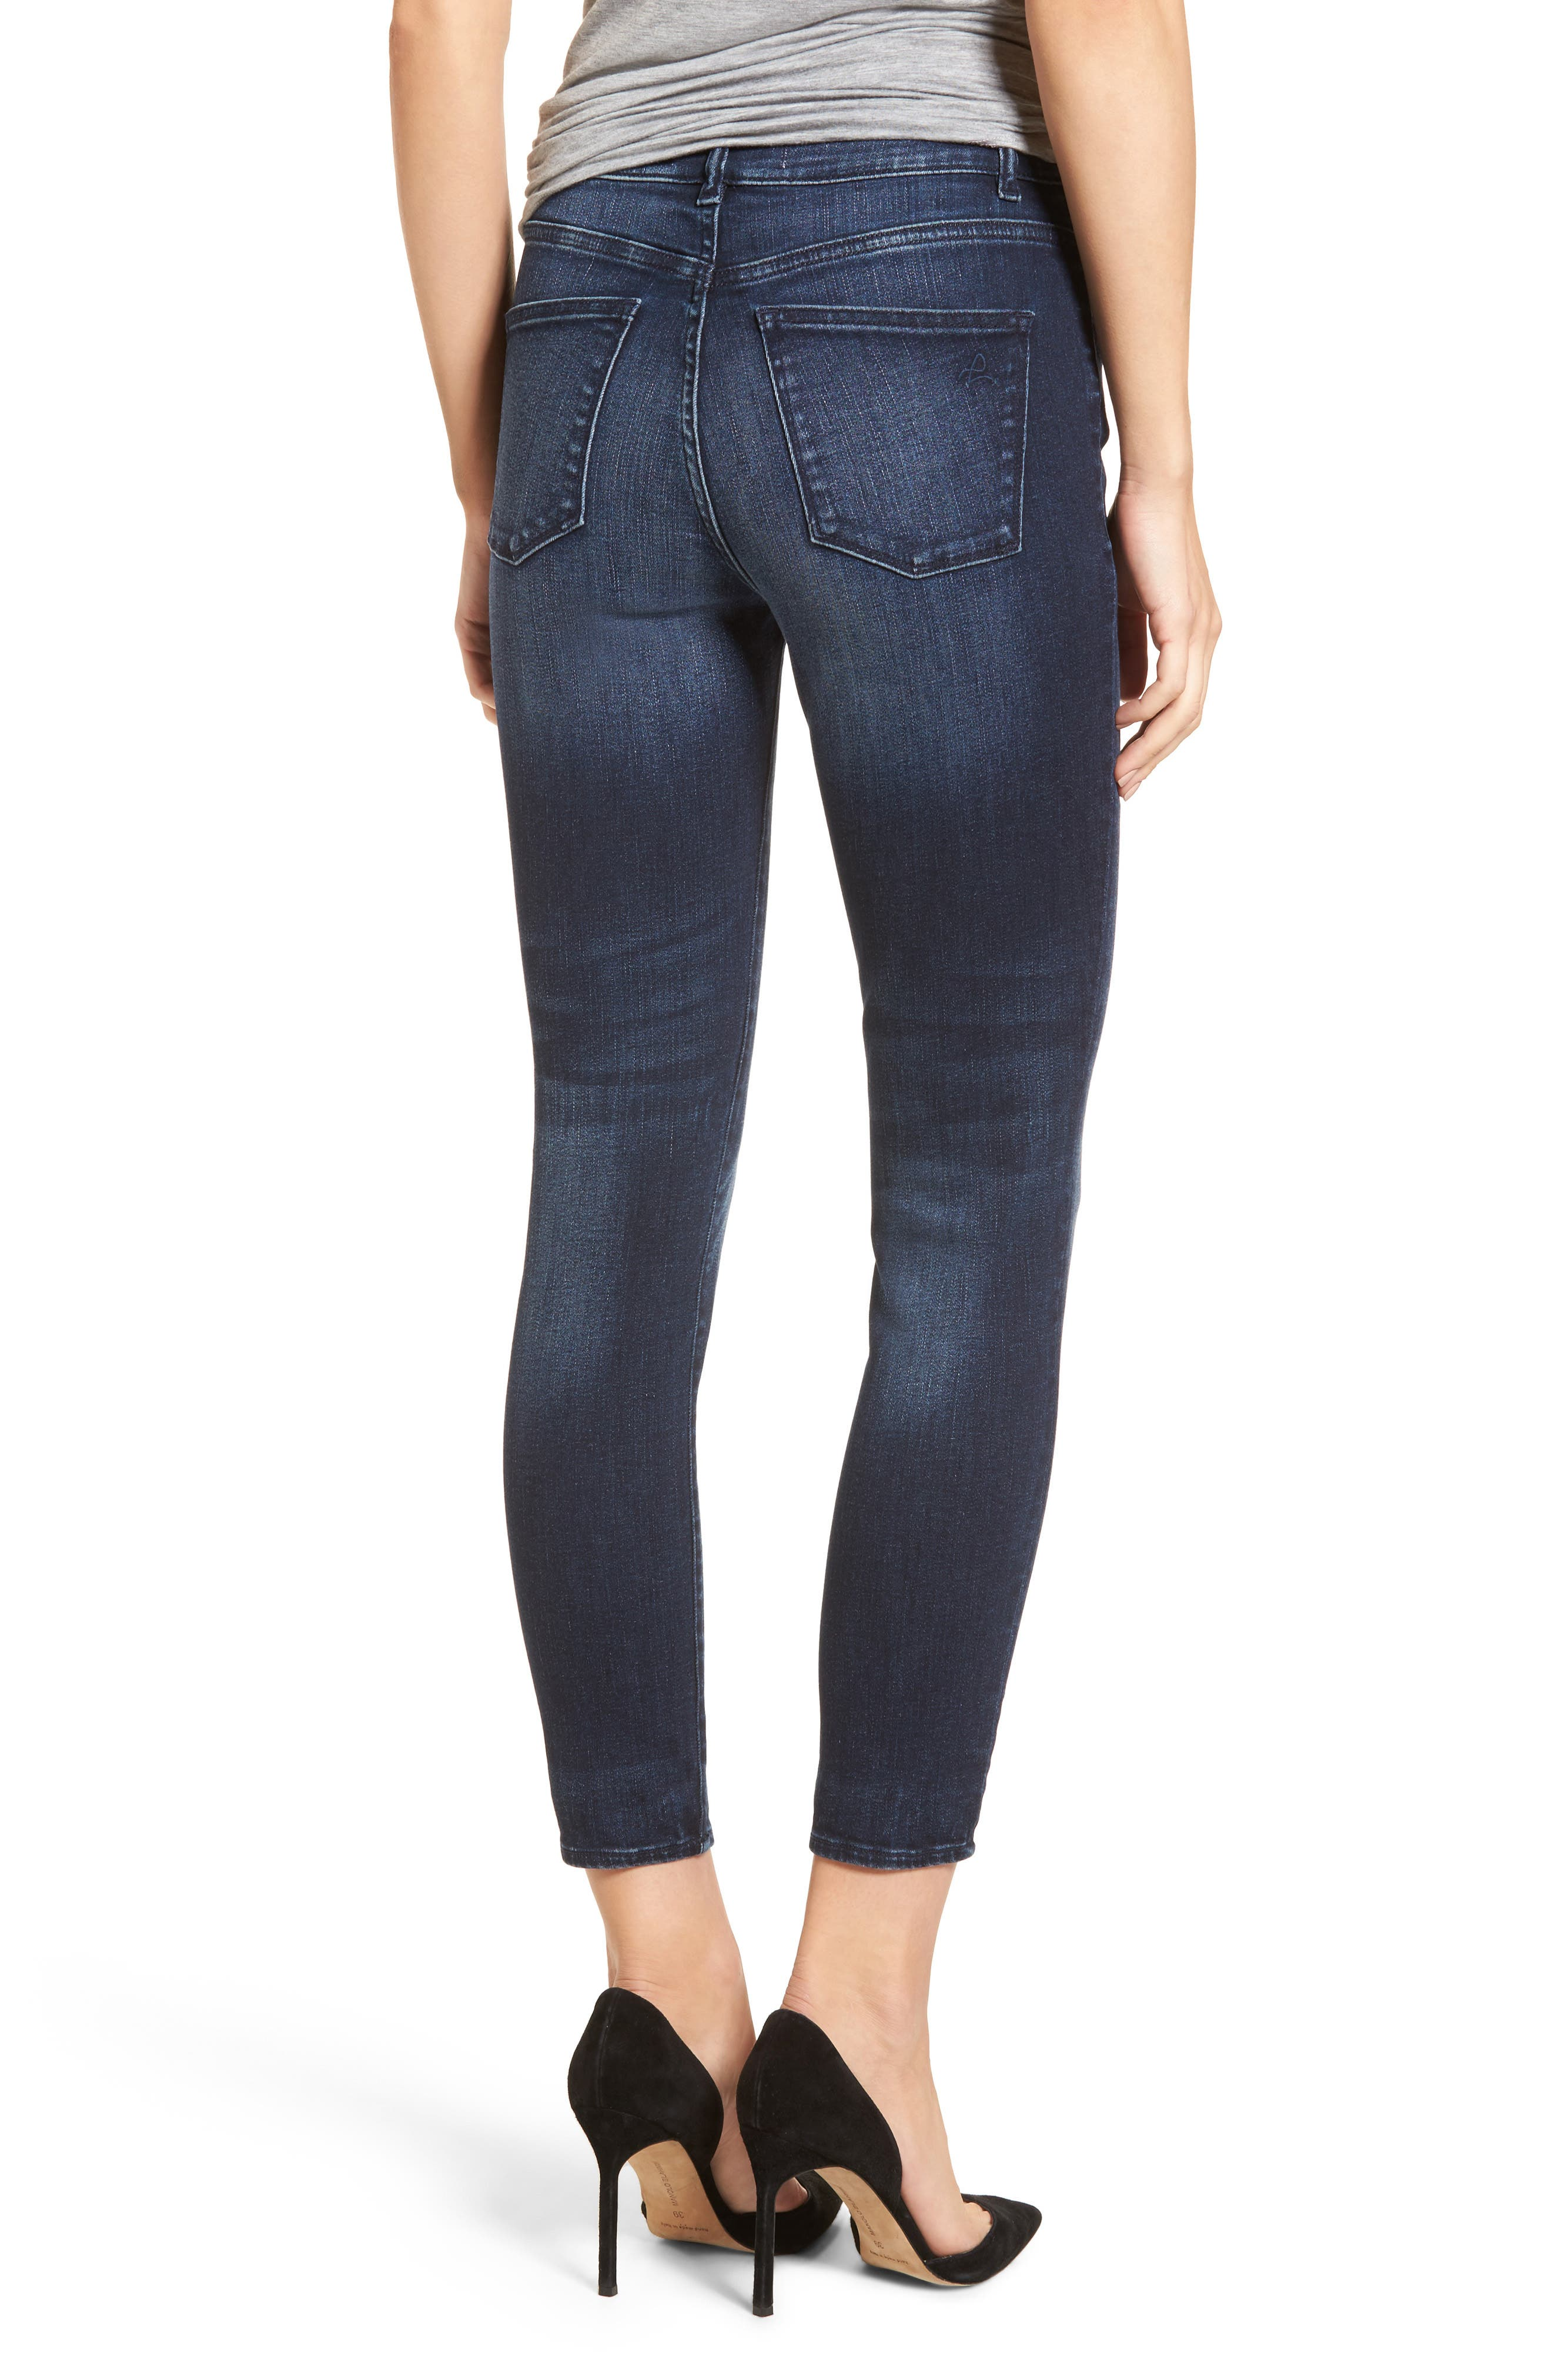 Carlie High Waist Ankle Skinny Jeans,                             Alternate thumbnail 2, color,                             Spritz